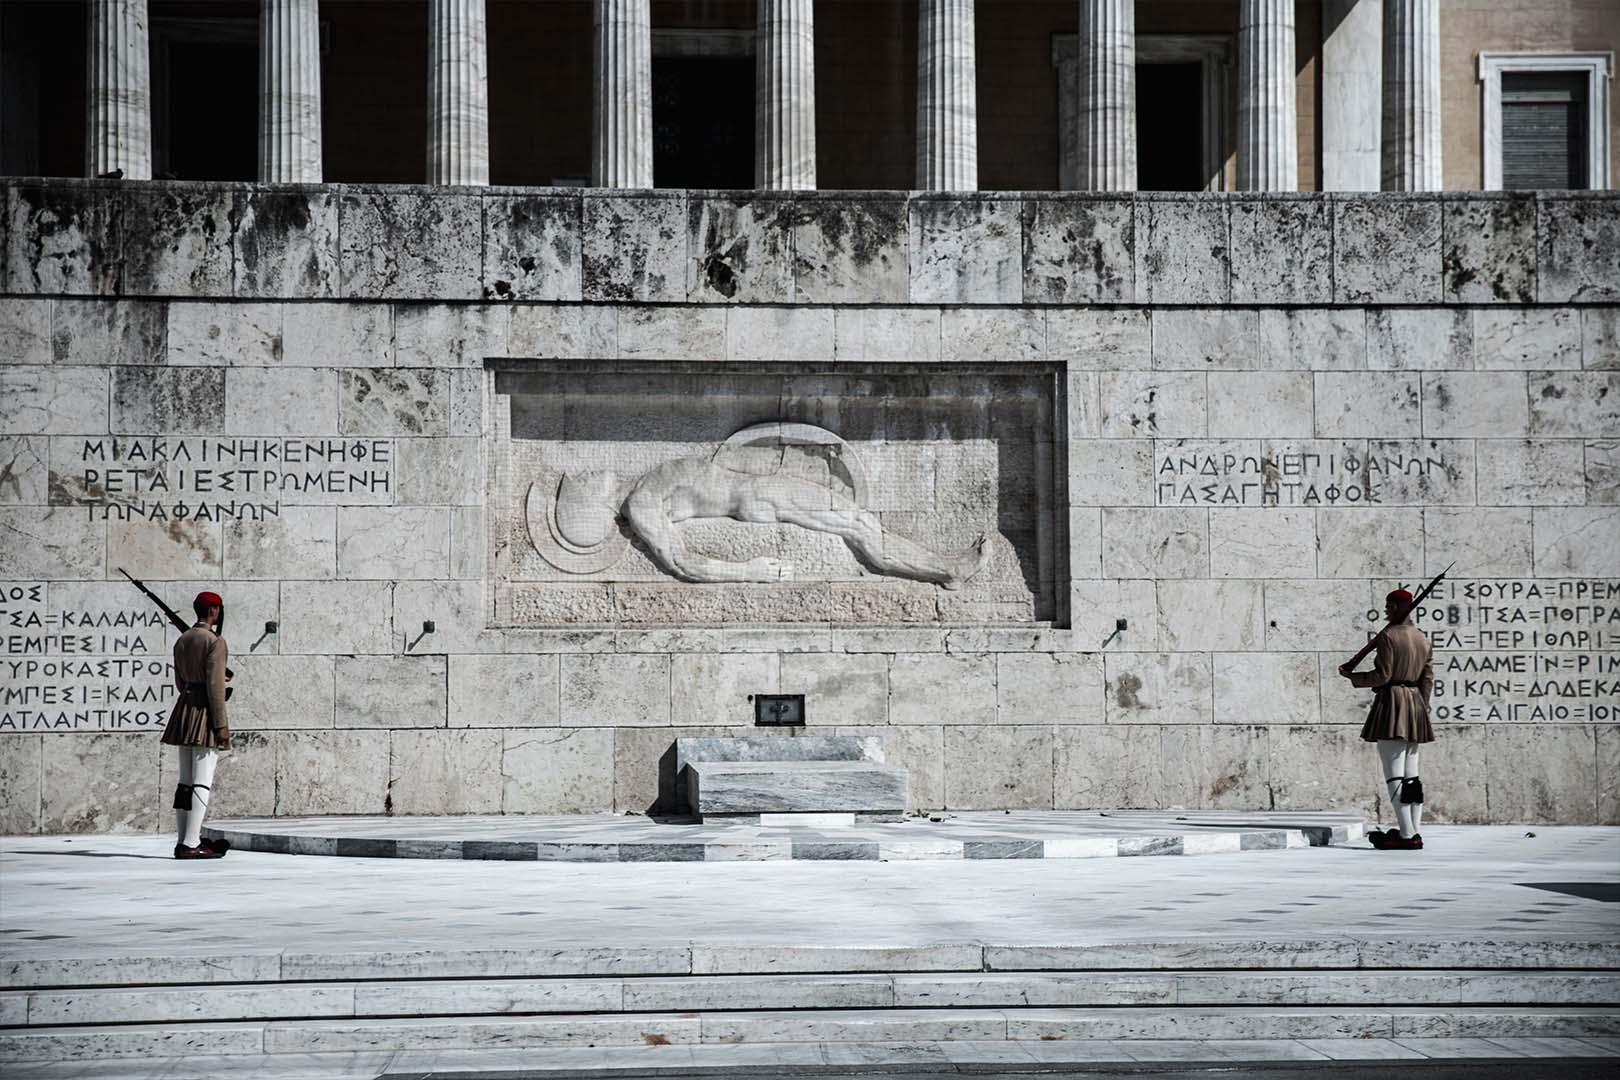 Parliament Vouli Syntagma Athens